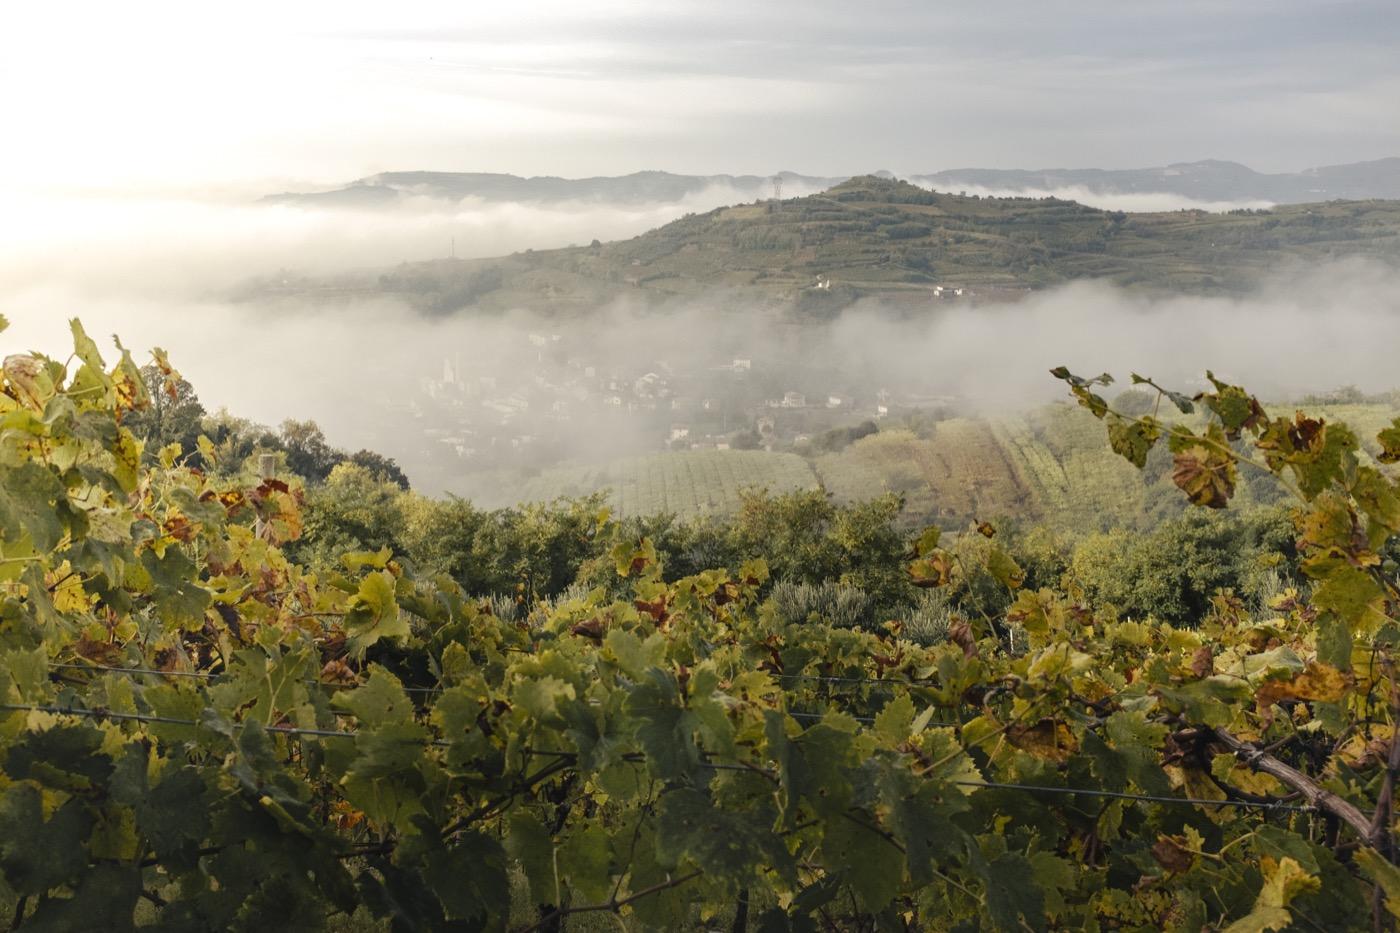 Sauro-Maule-wineyards-hill-gambellara_RUI2789_p_1400